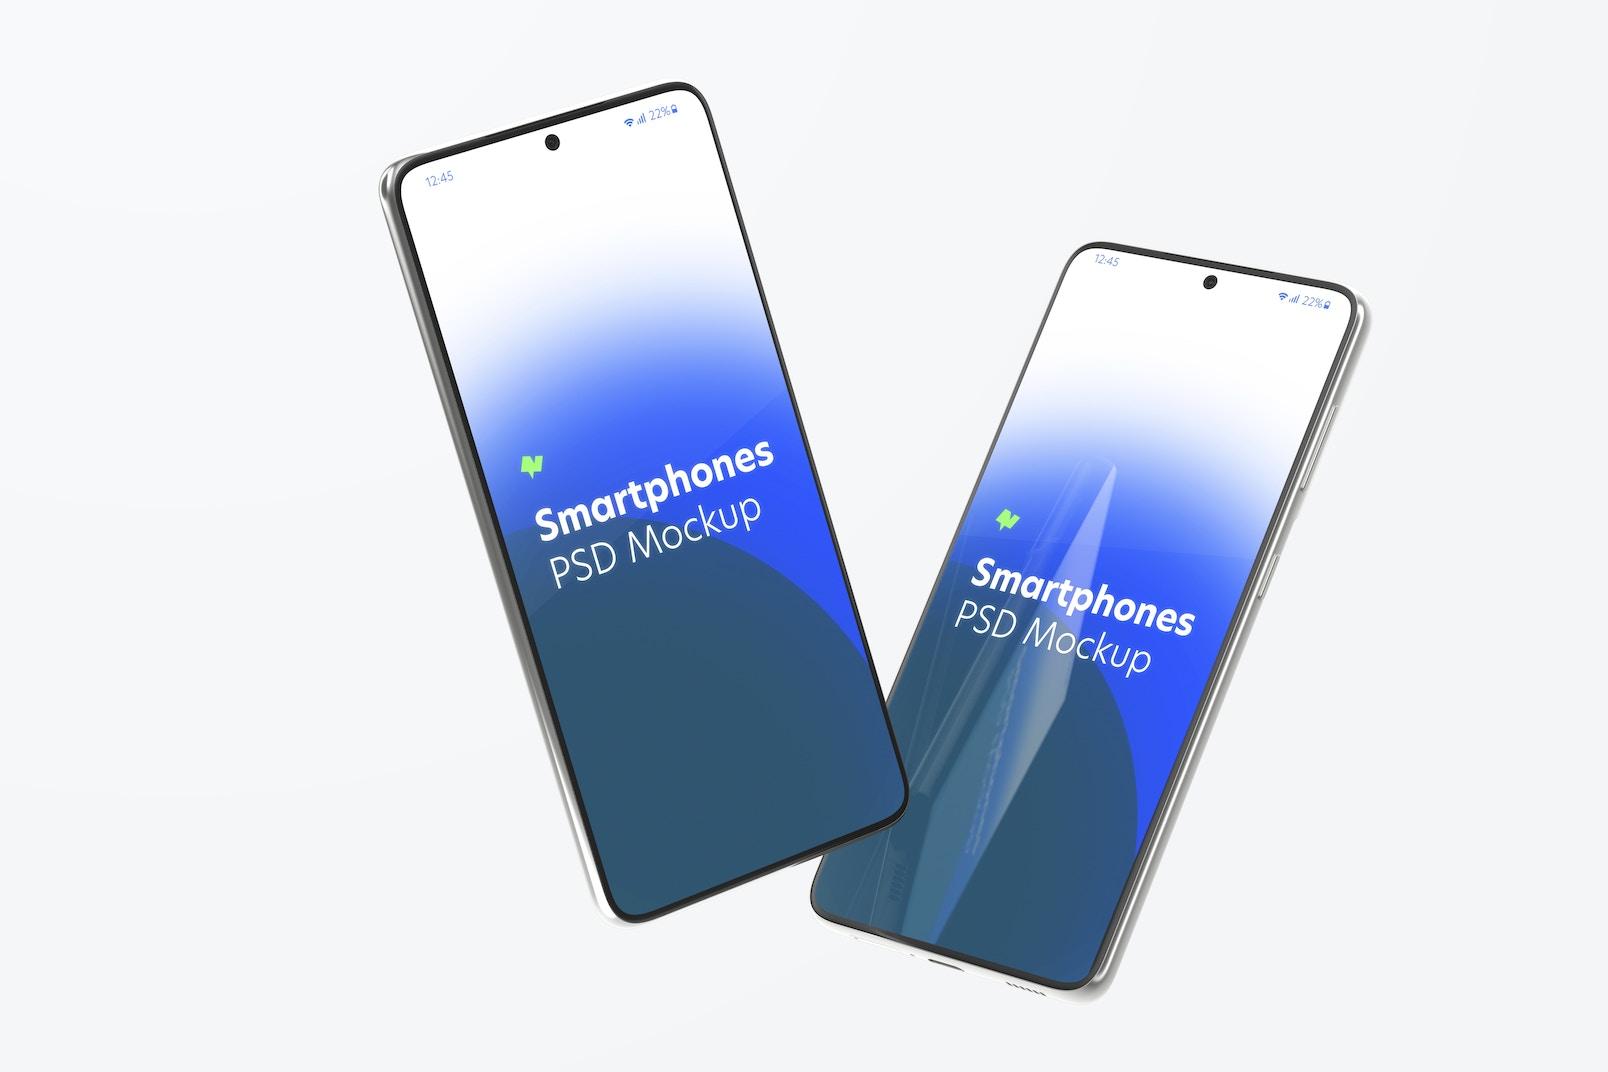 Maqueta de Samsung S21, Flotando